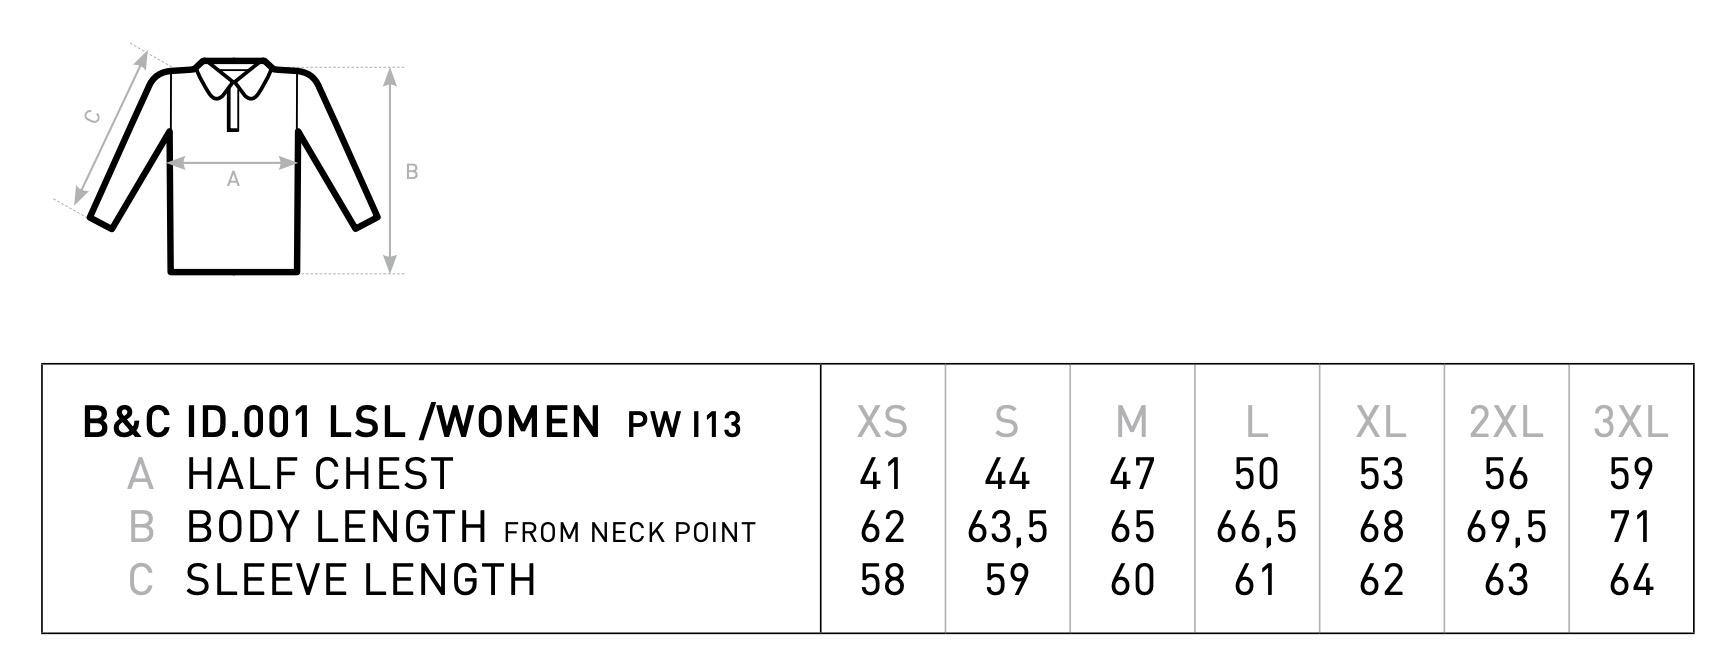 B&C: ID.001 LSL women Polo PWI13